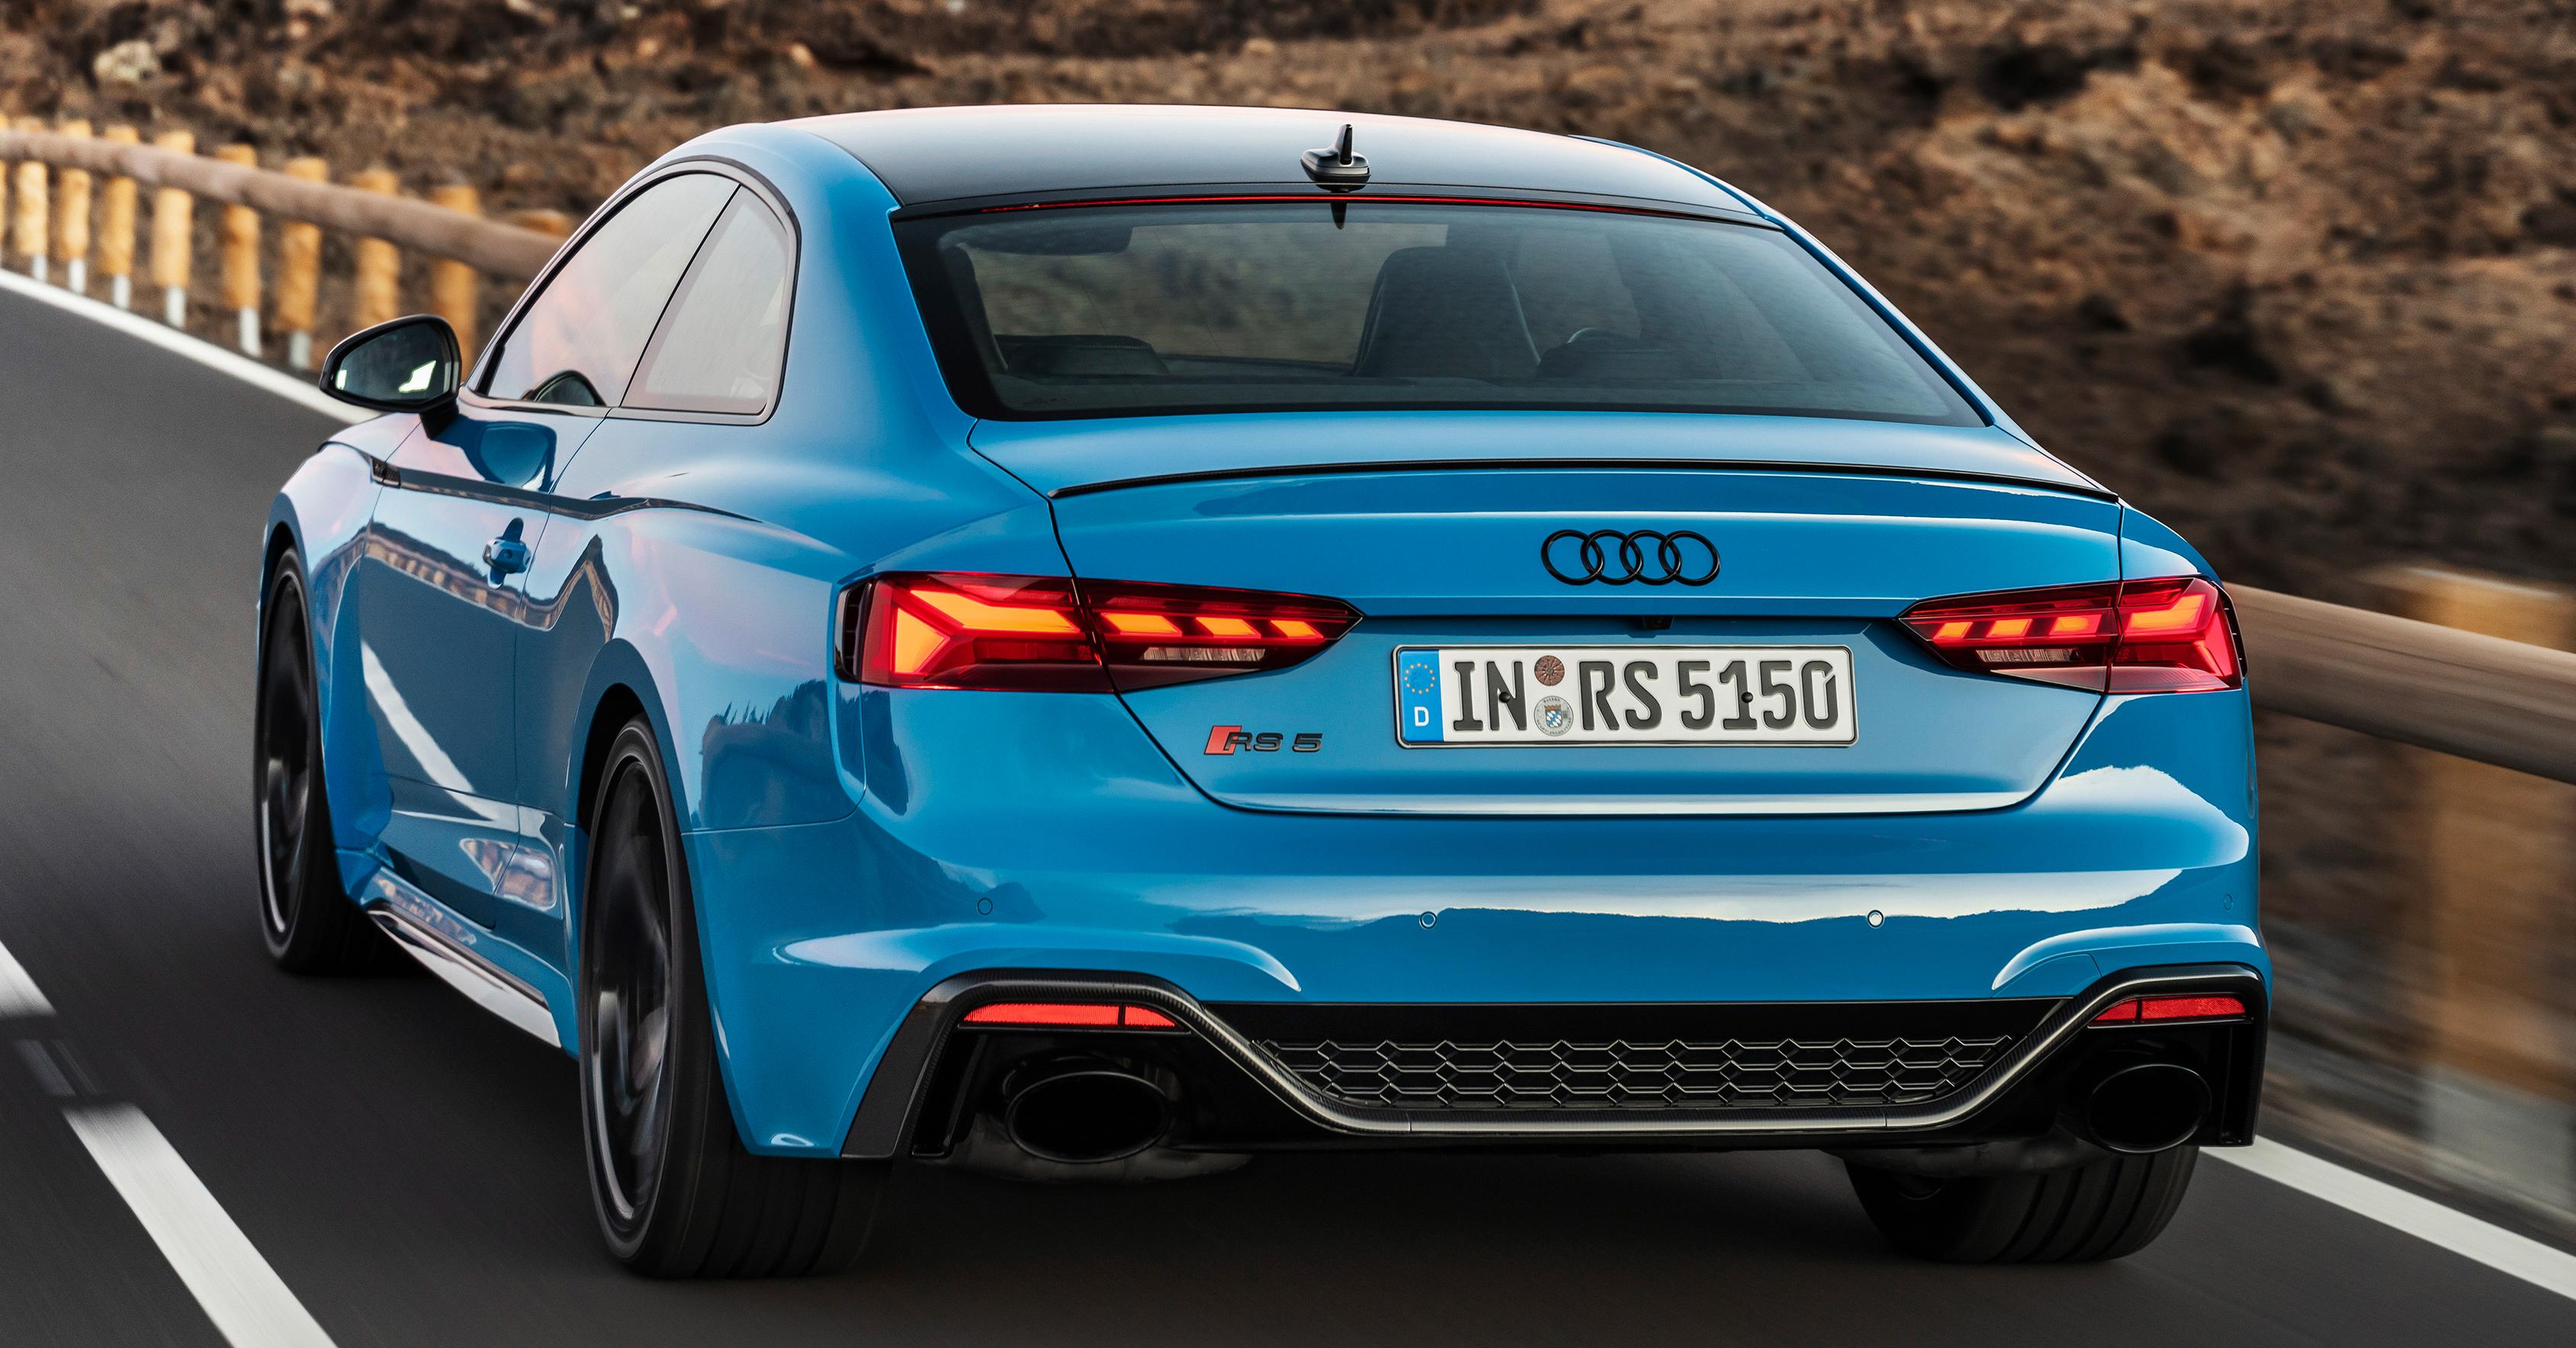 2020 Audi RS5 Coupe, Sportback facelift debut - 2.9L V6 TFSI, 450 hp & 600 Nm; minor upgrades ...